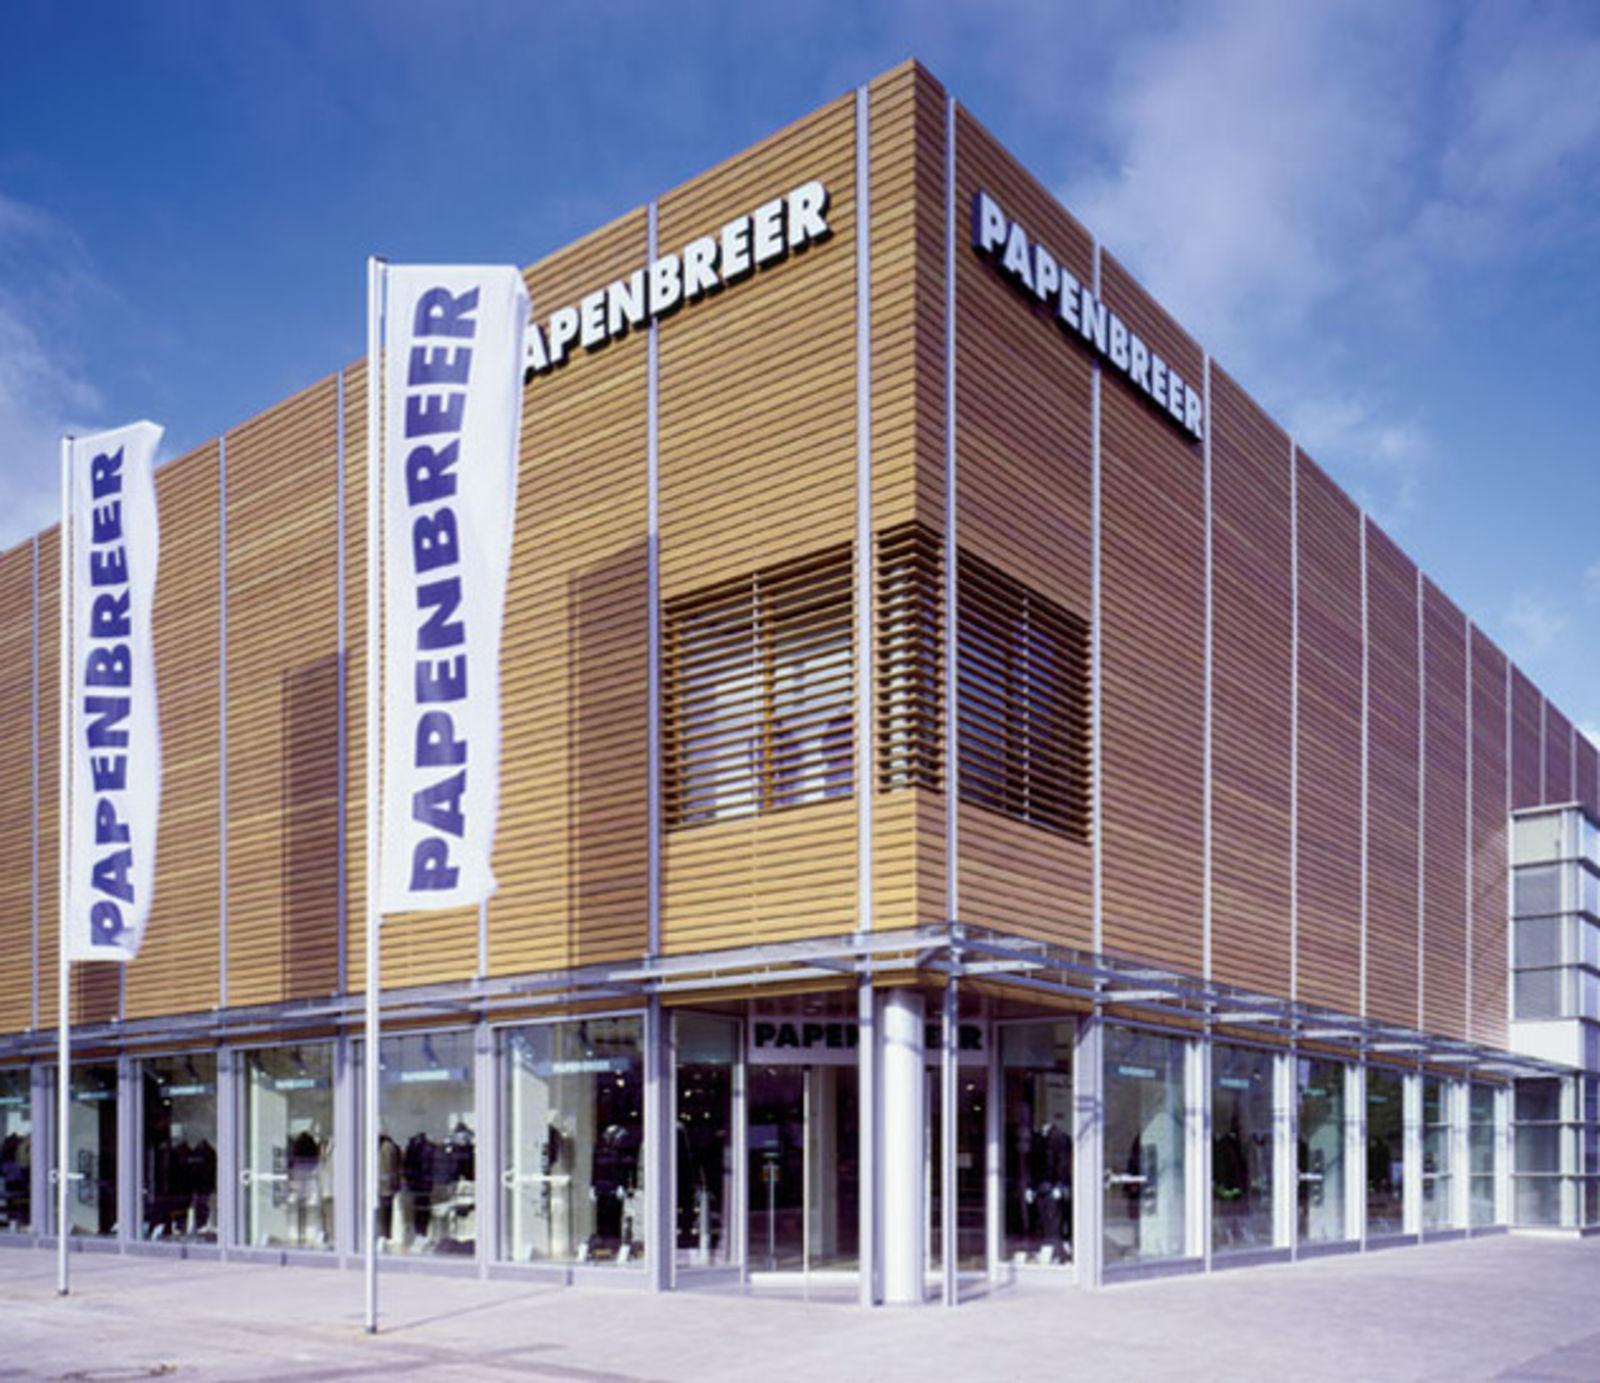 Papenbreer in Magdeburg (Bild 3)